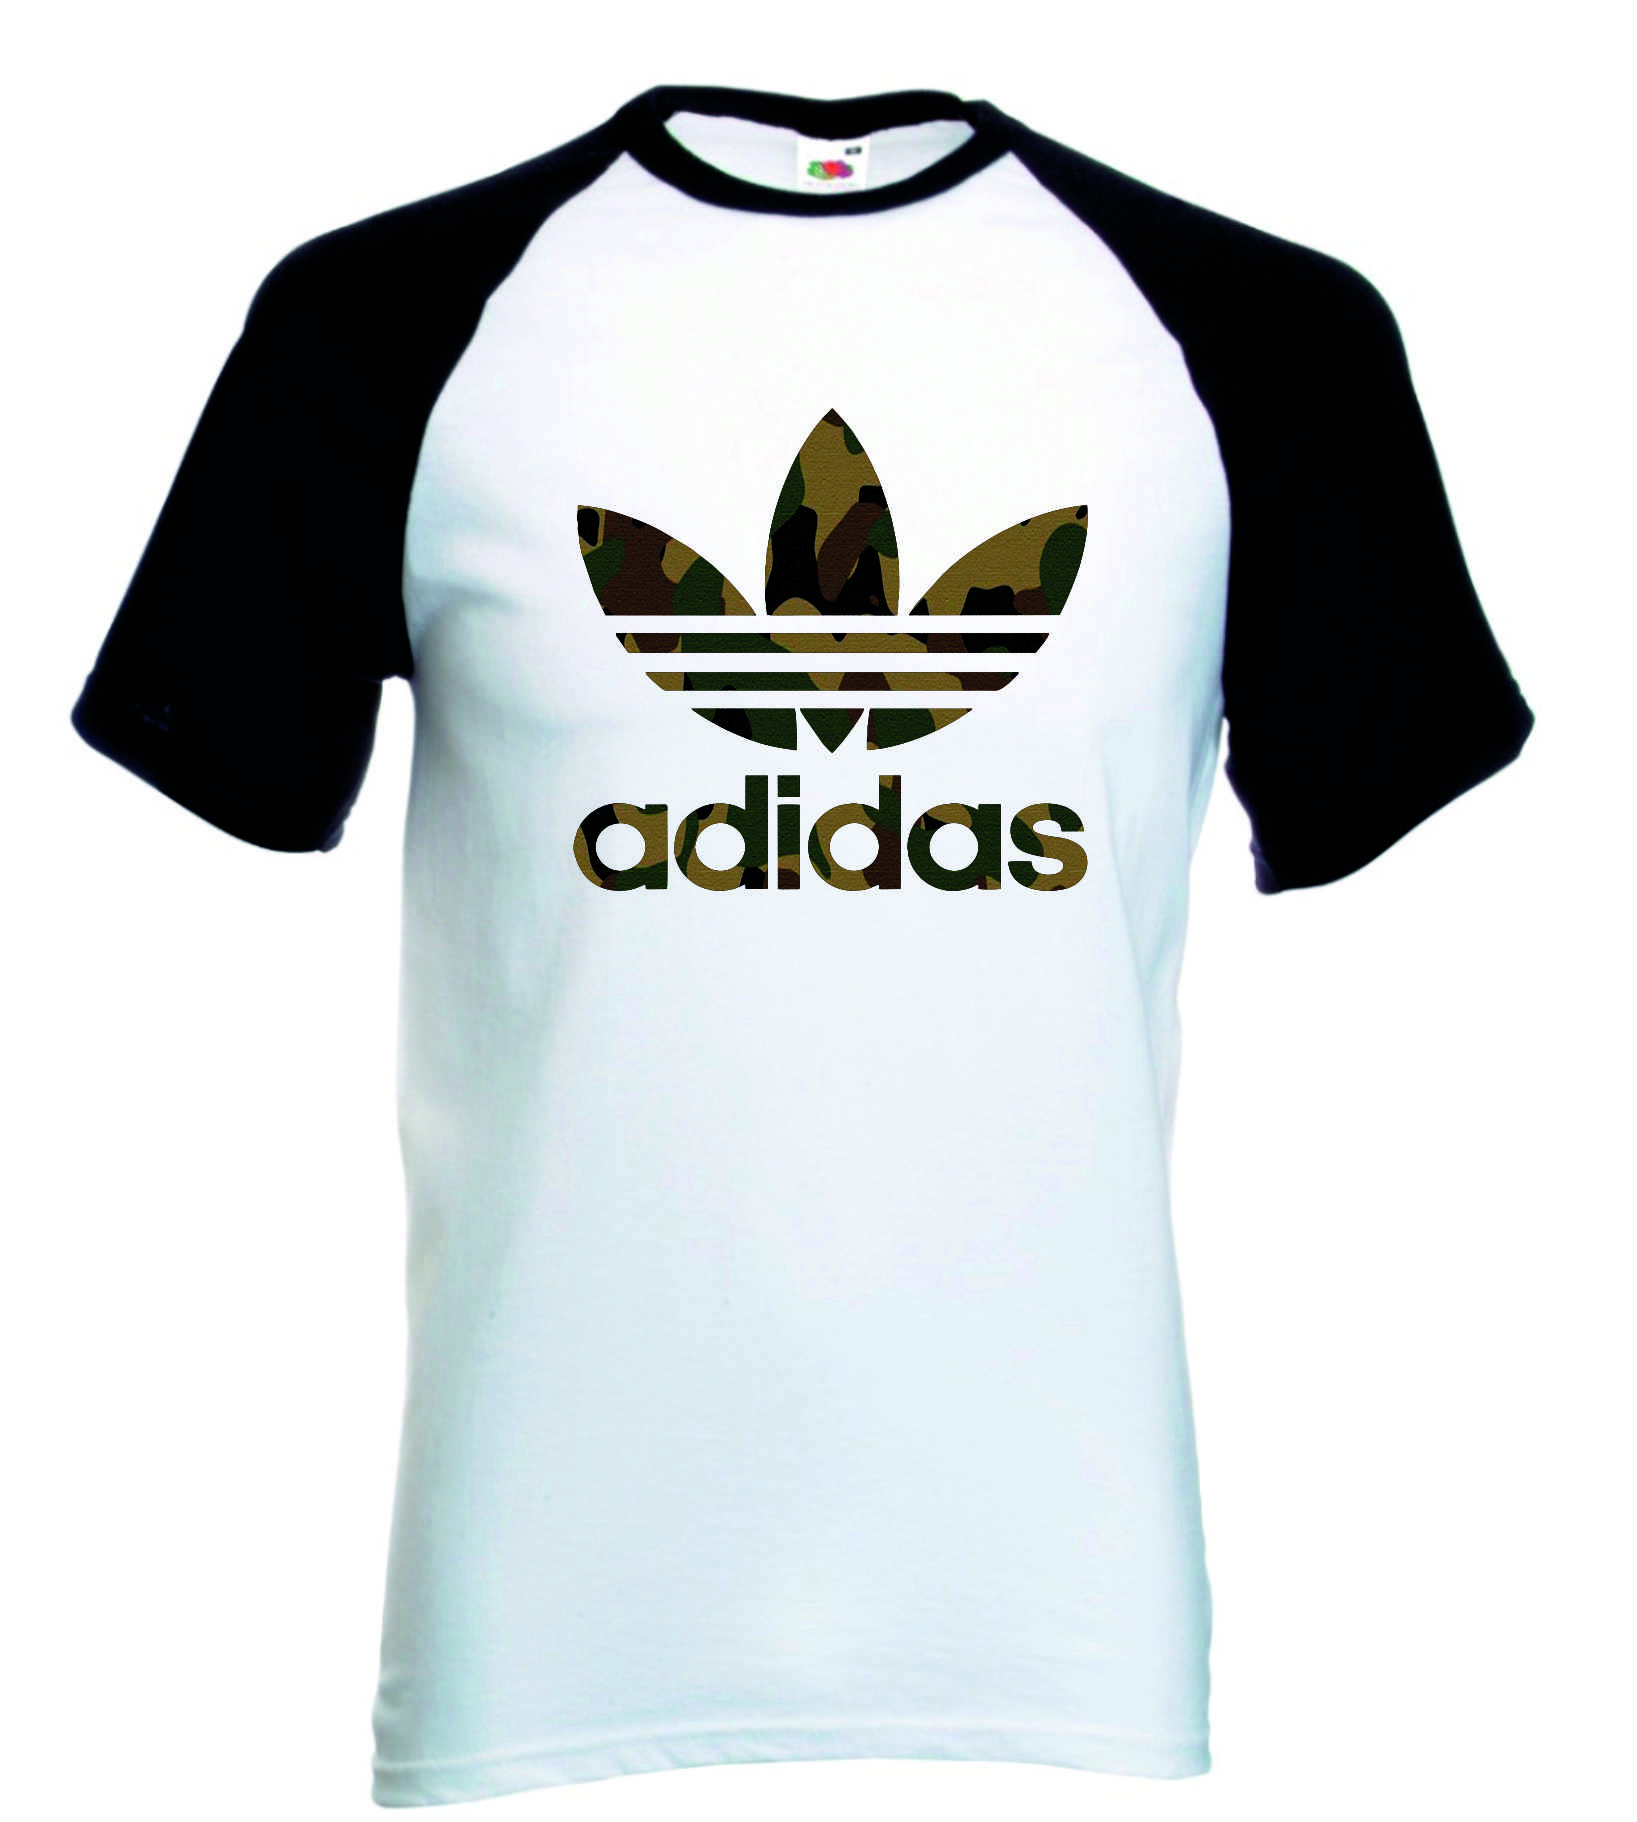 dbb2fbc2dd1 Camiseta Raglan Adidas no Elo7